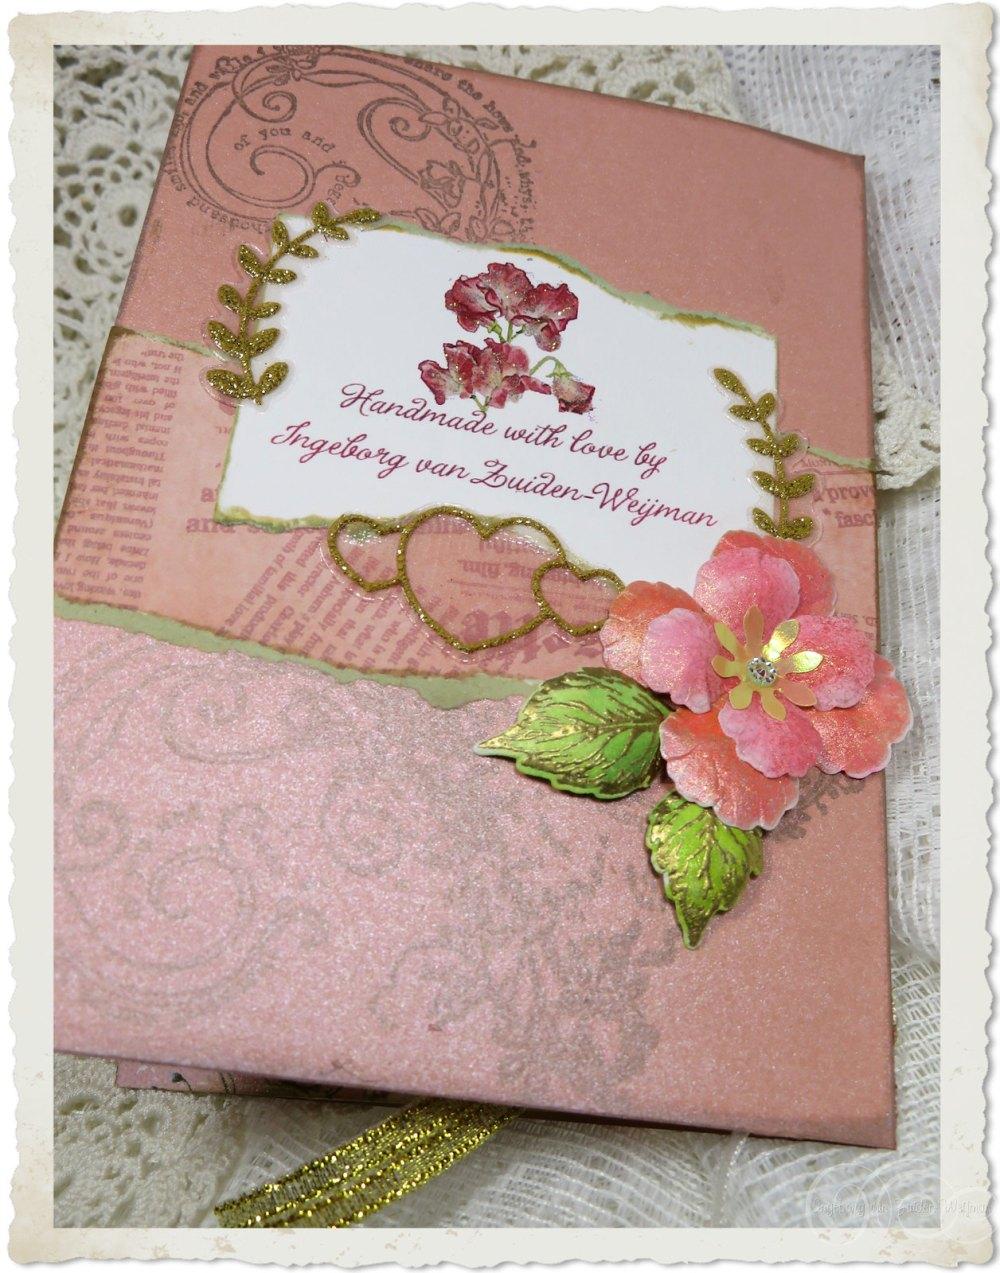 Backside of handmade pink card